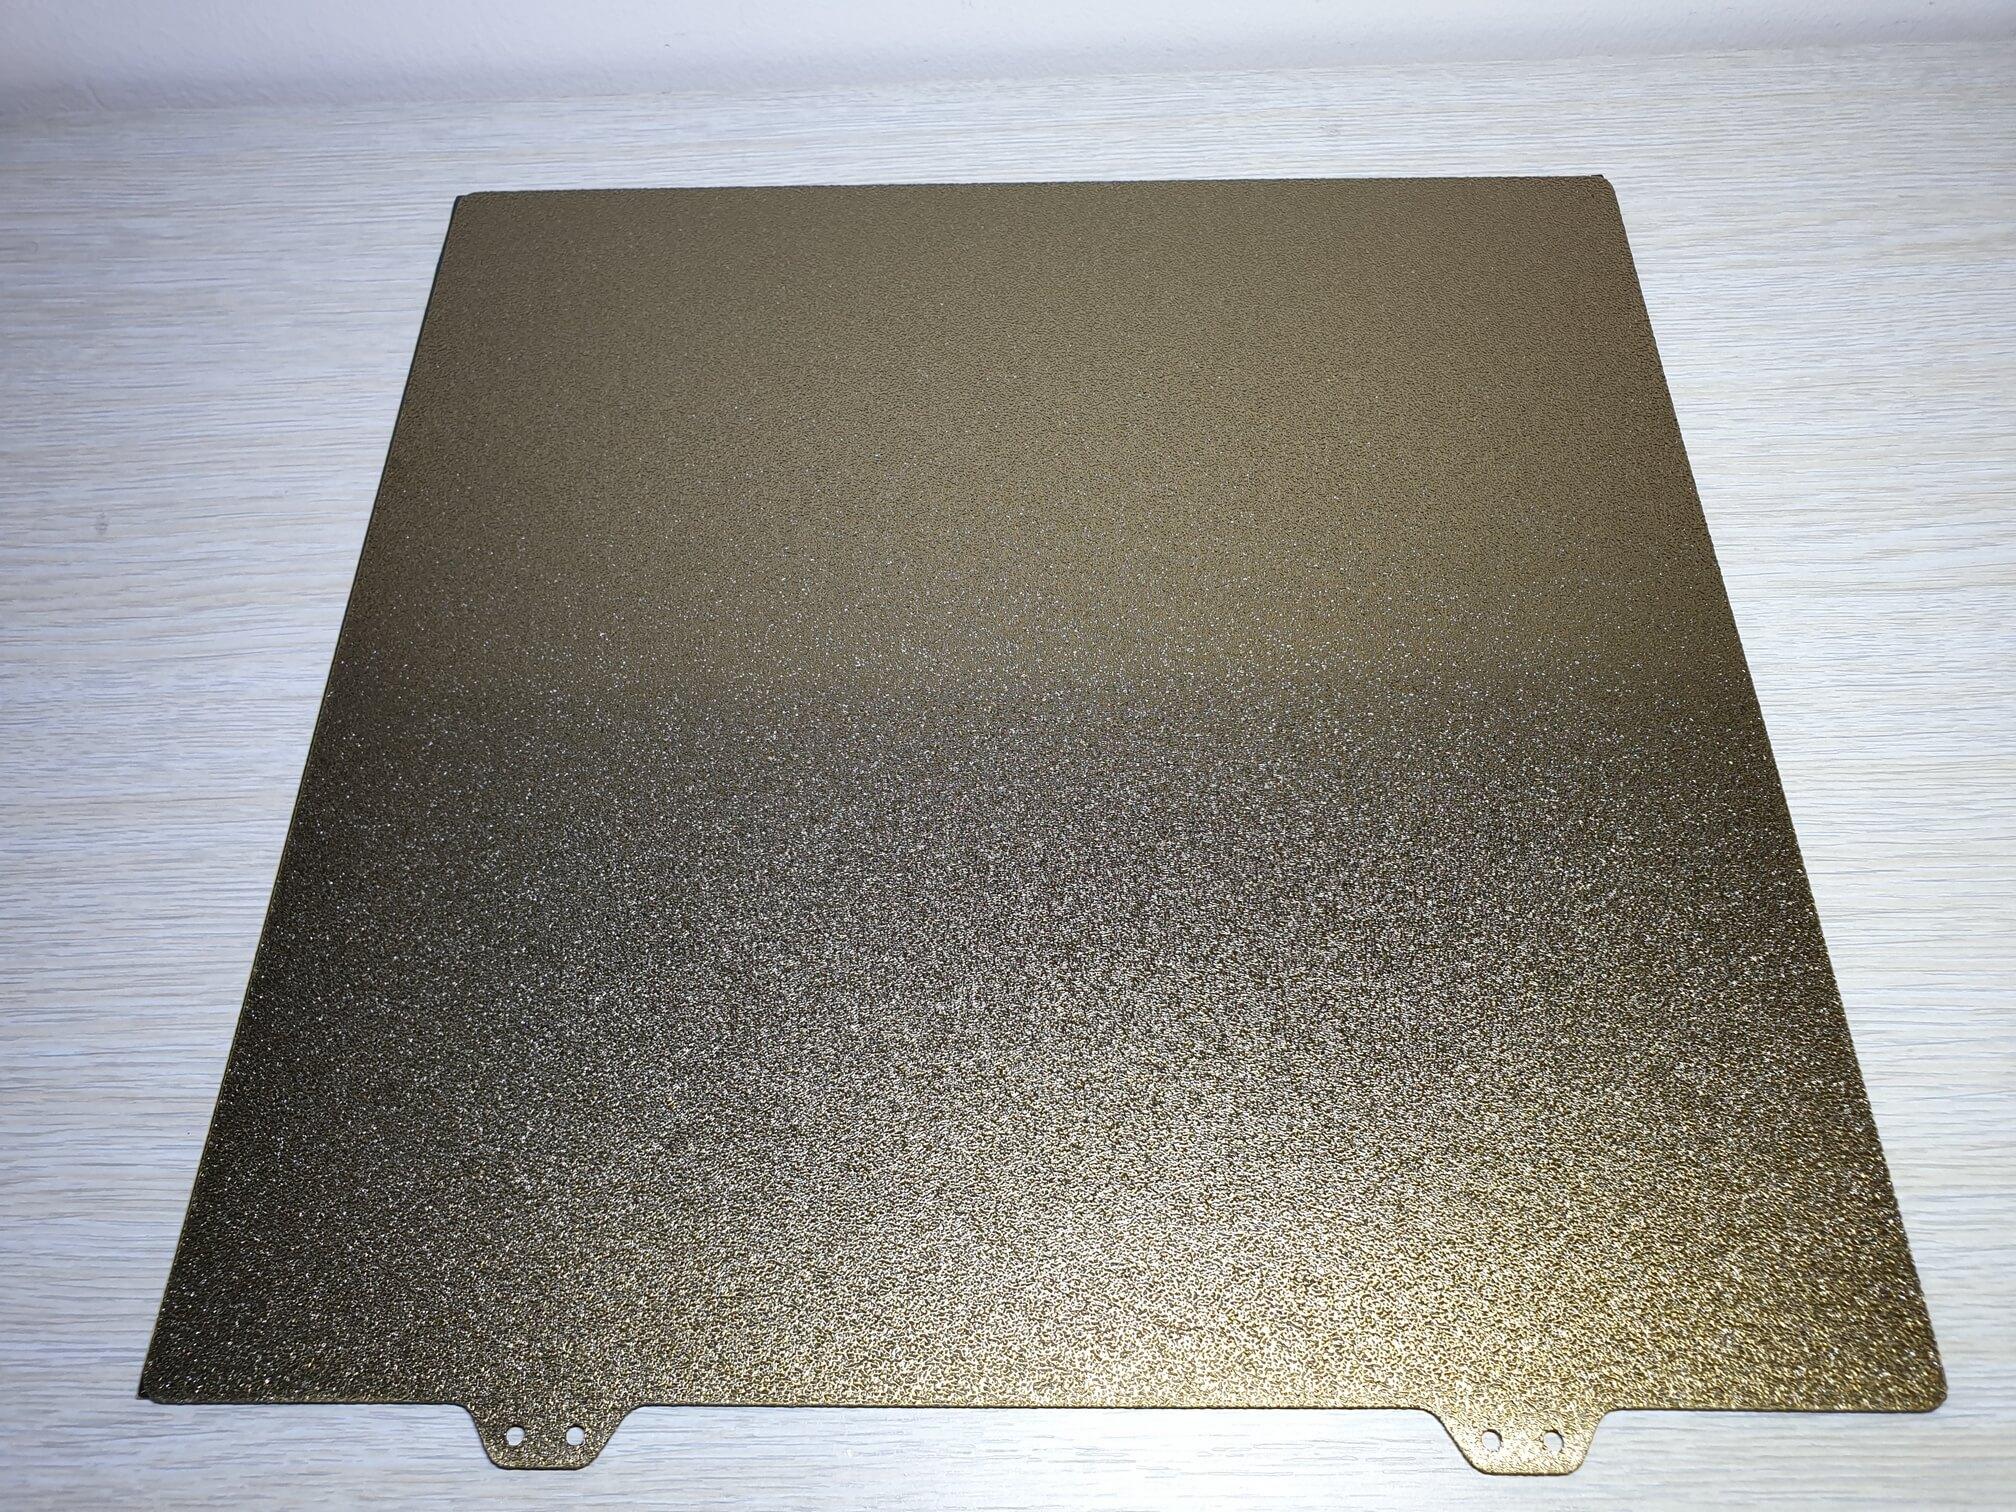 Textured PEI Powder Steel Plate from Banggood 2 | Textured PEI Powder Steel Plate from Banggood